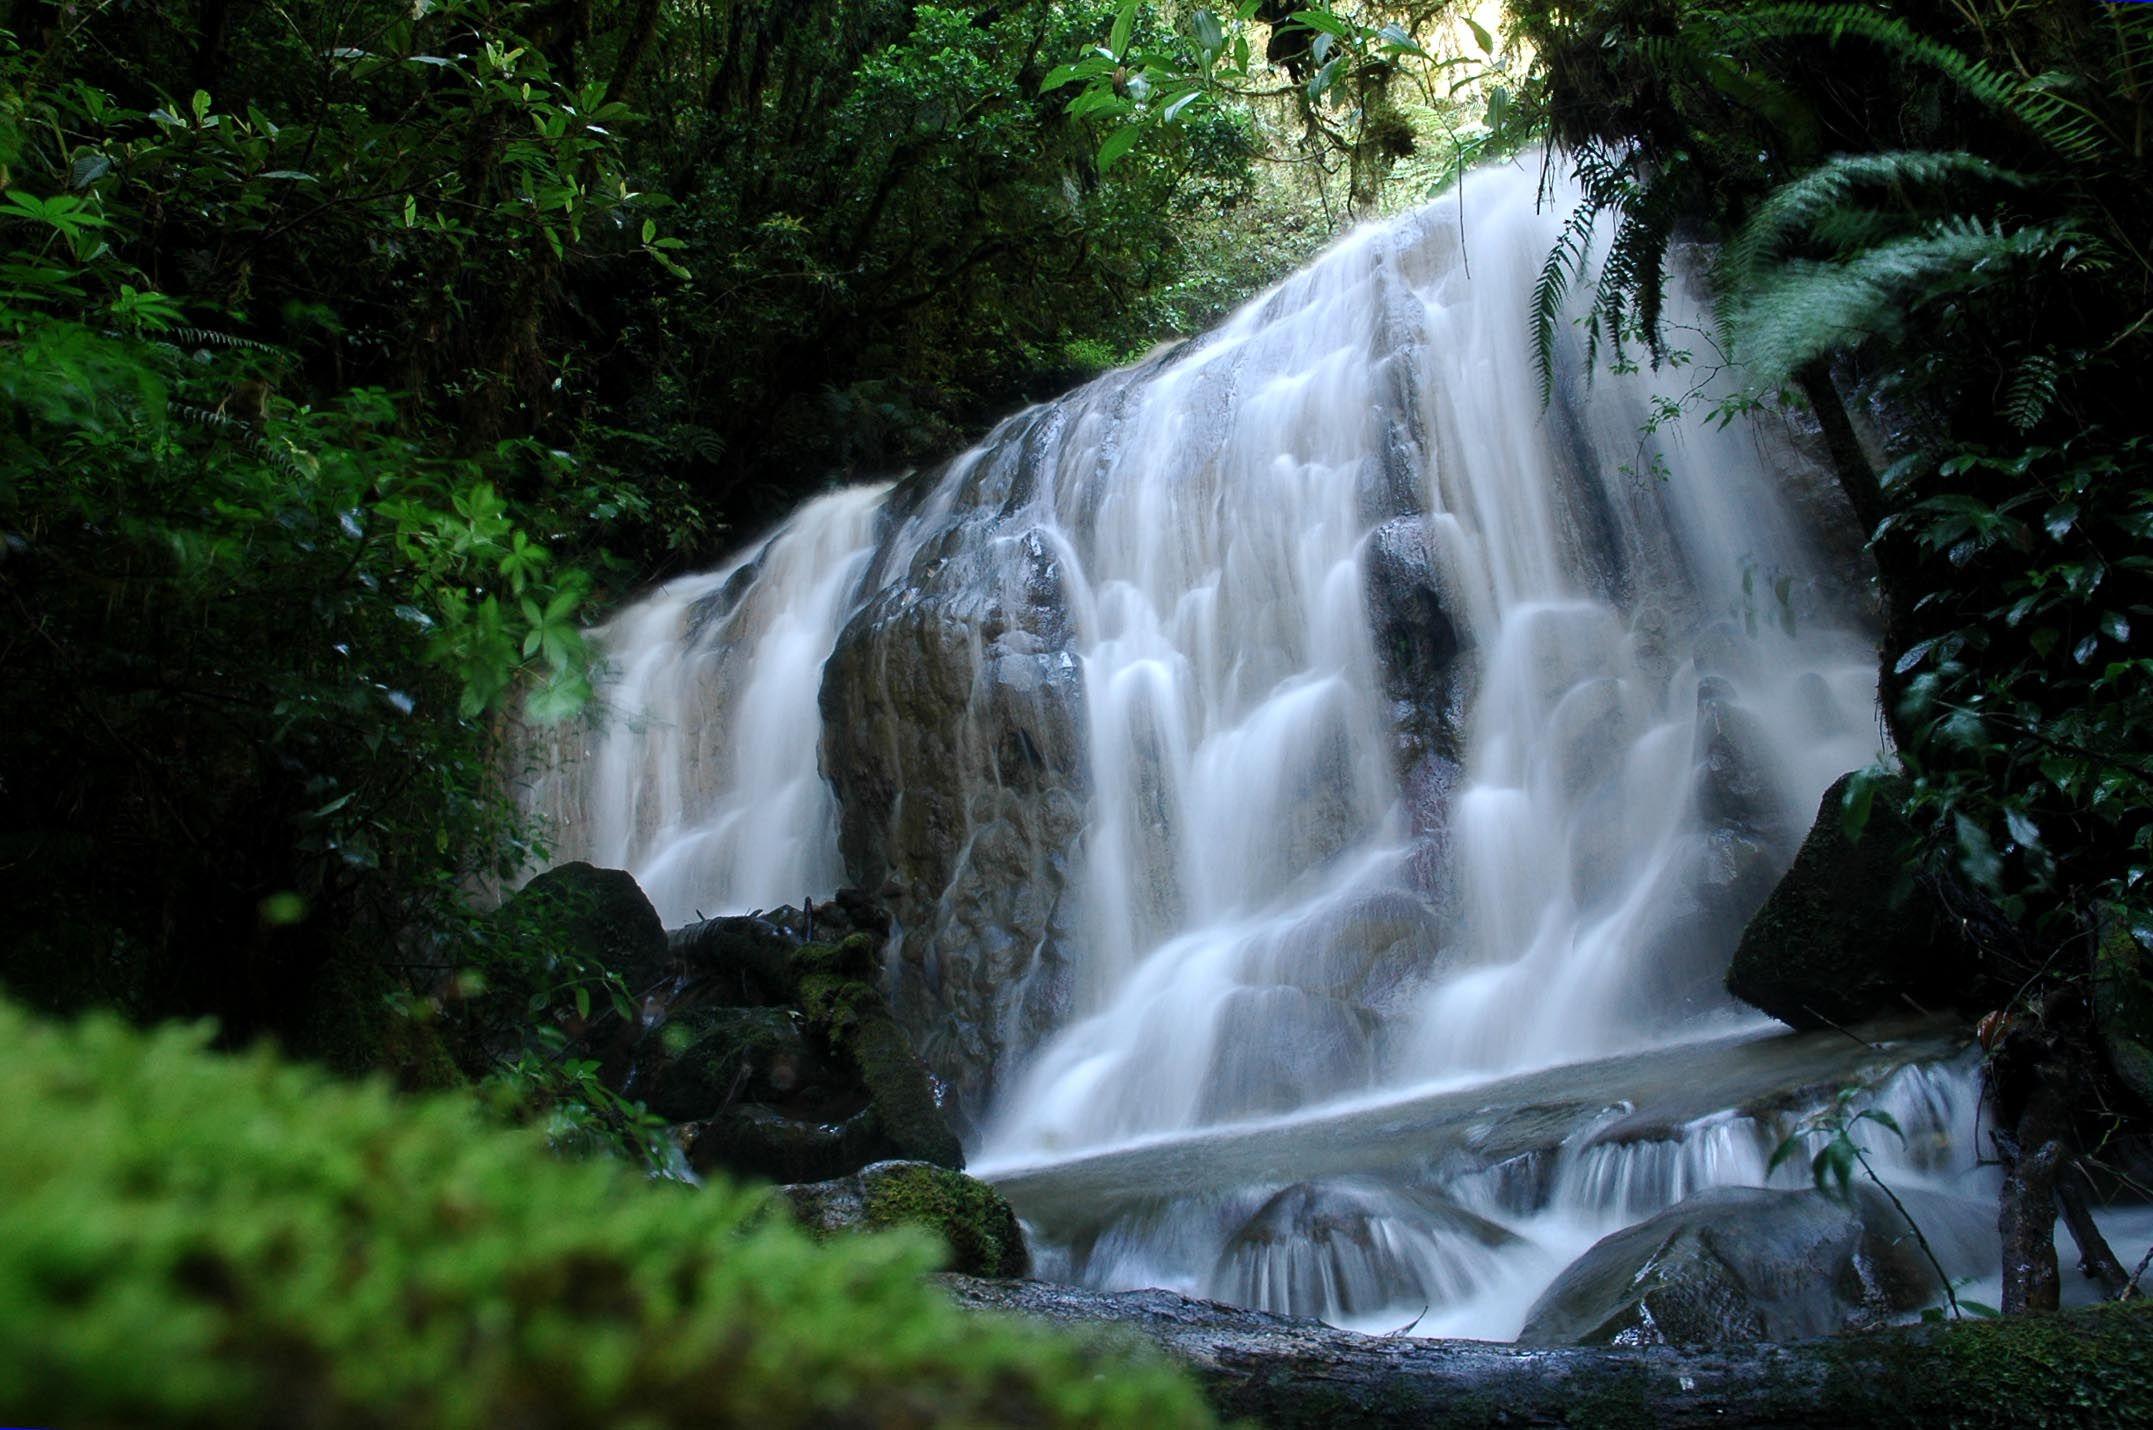 Air Terjun Pancaweuleuh Gunung Gede Pangrango Air Terjun Air Pegunungan